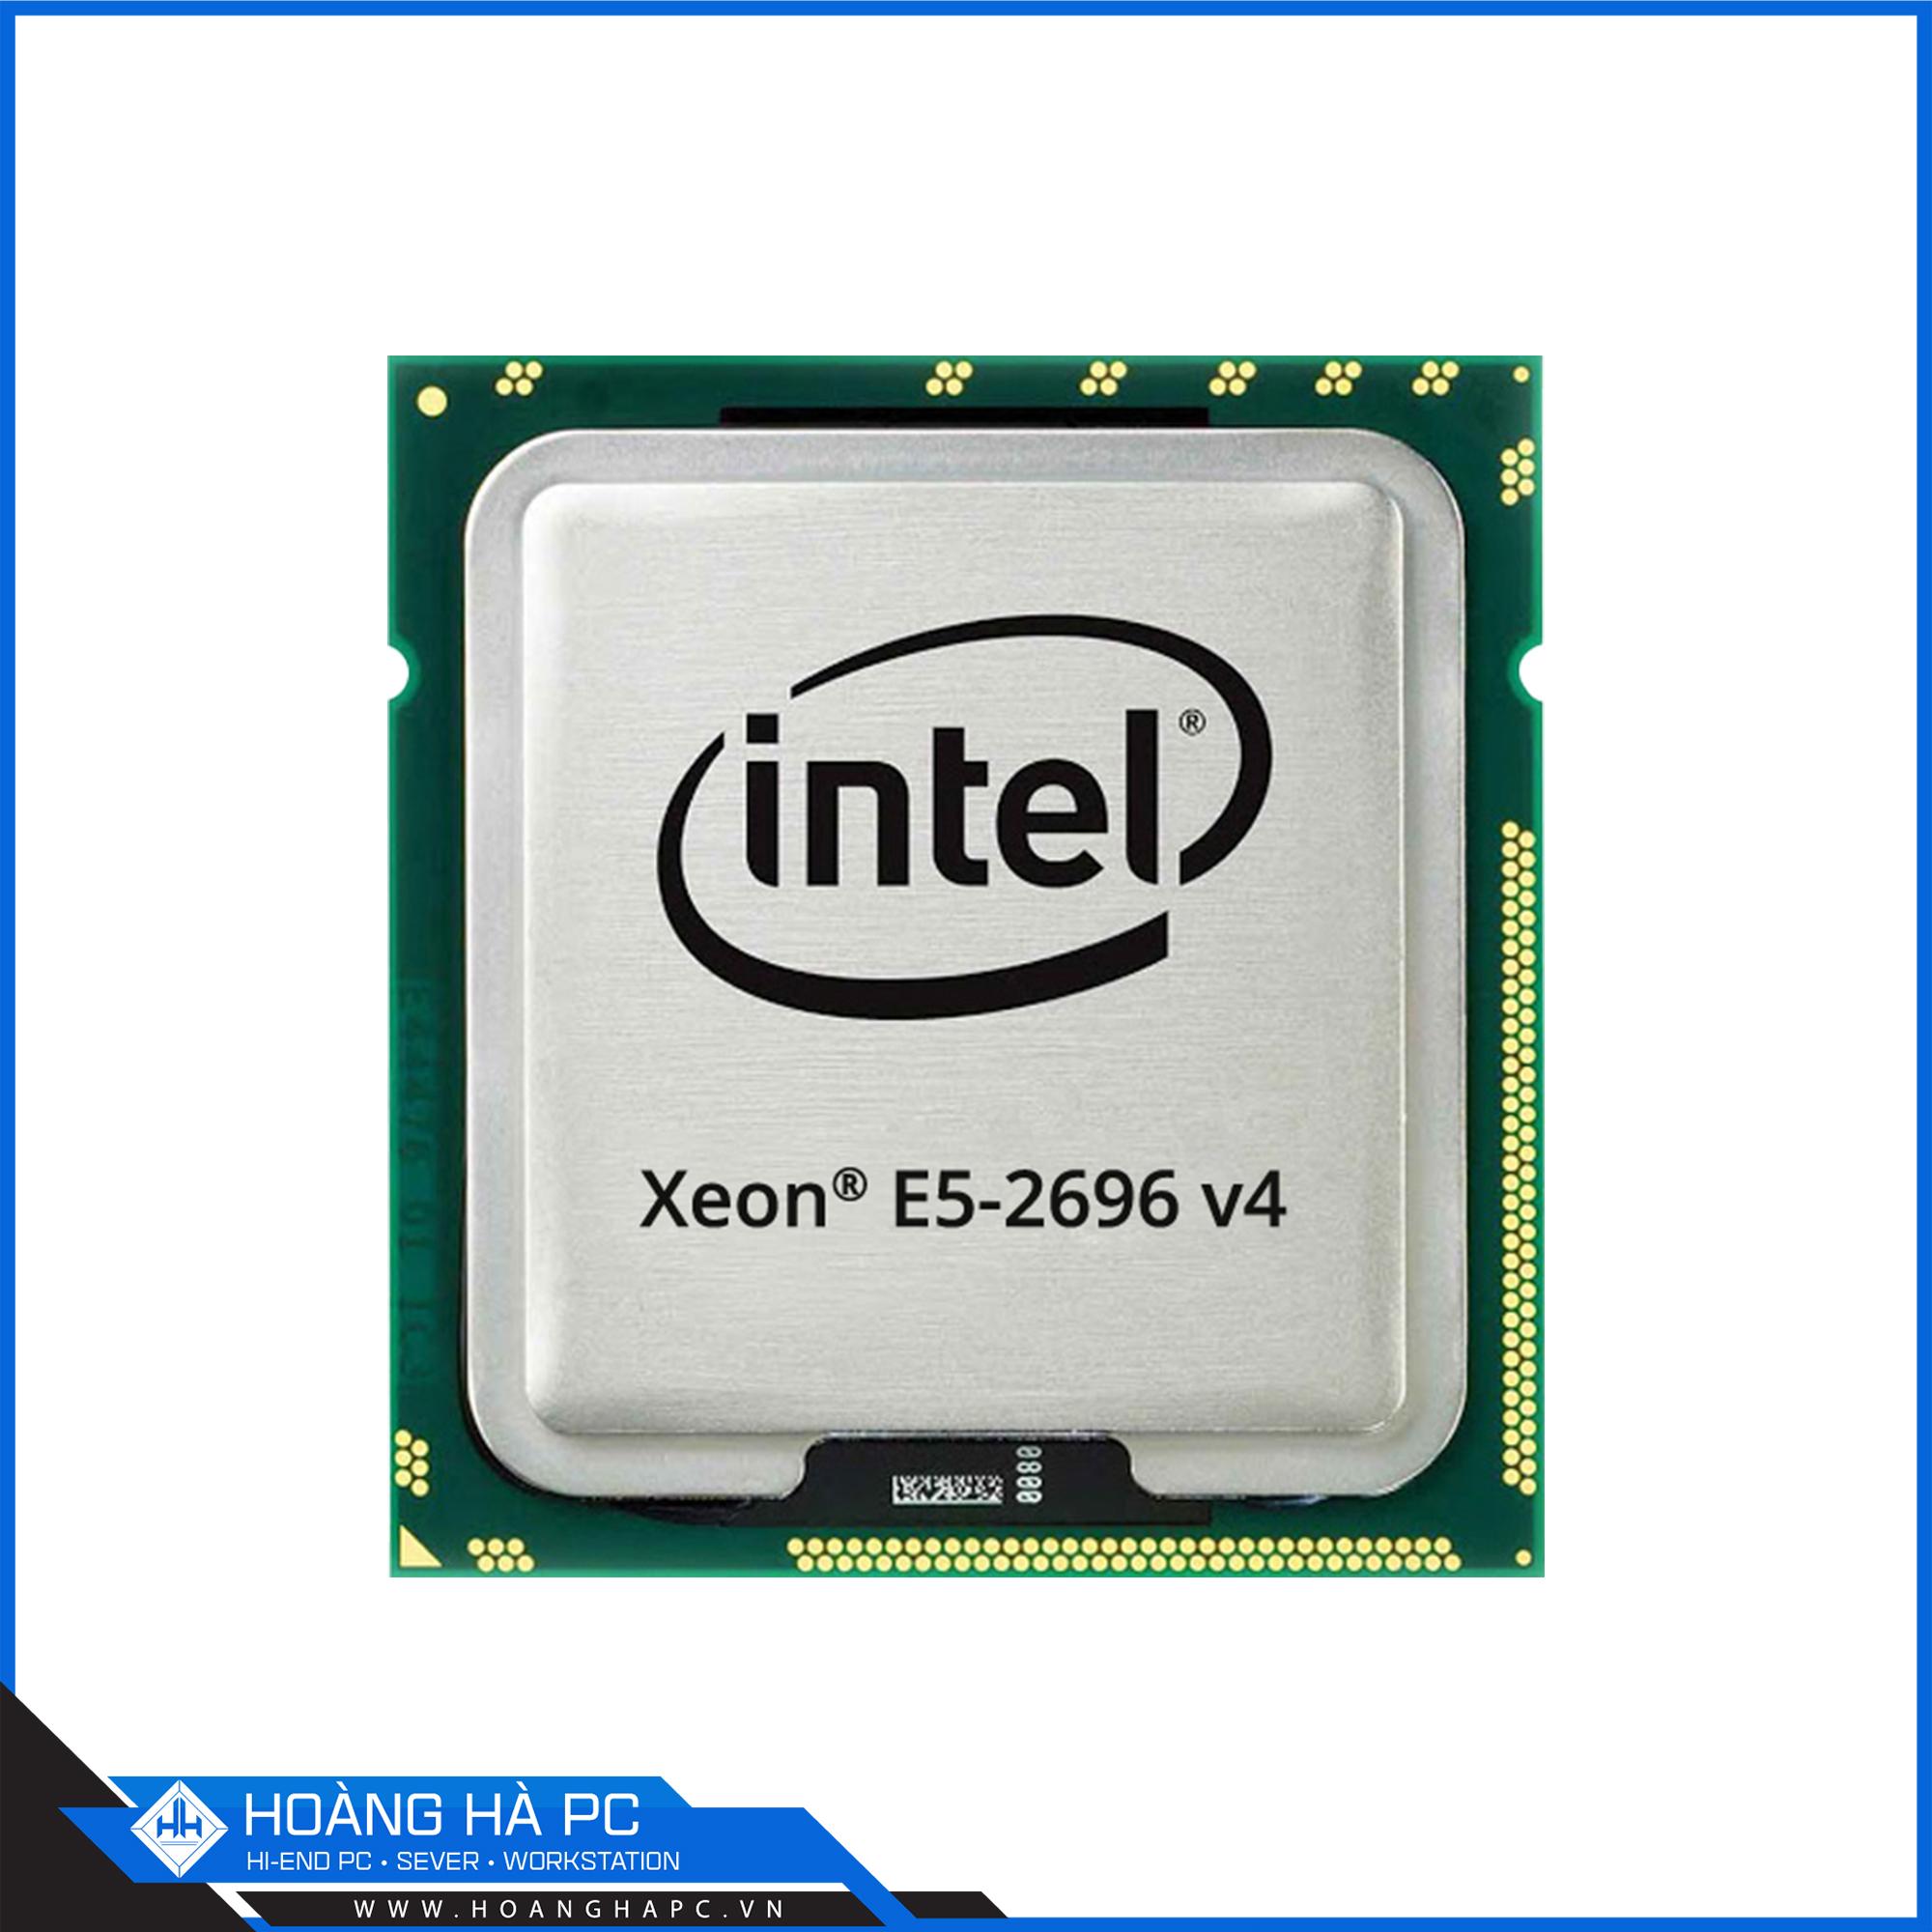 Intel XEON E5 2699V4